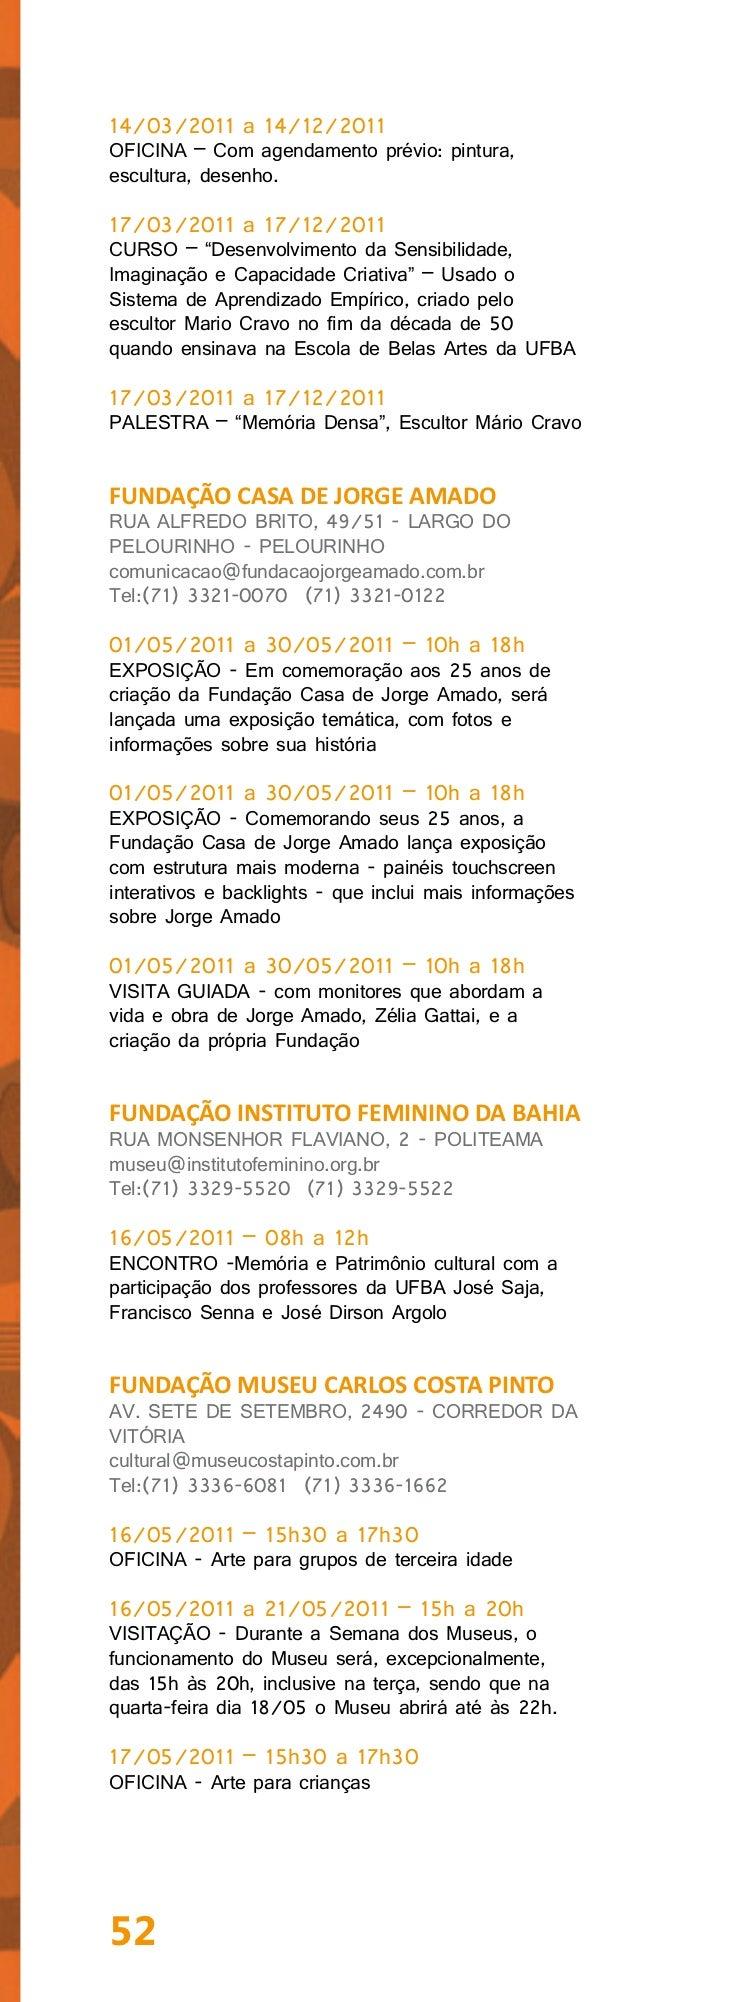 "18/05/2011 – 15h a 22hVISITA GUIADA - Dia especial ""Minha primeira visitaao Museu Carlos Costa Pinto"", visitas especiais c..."